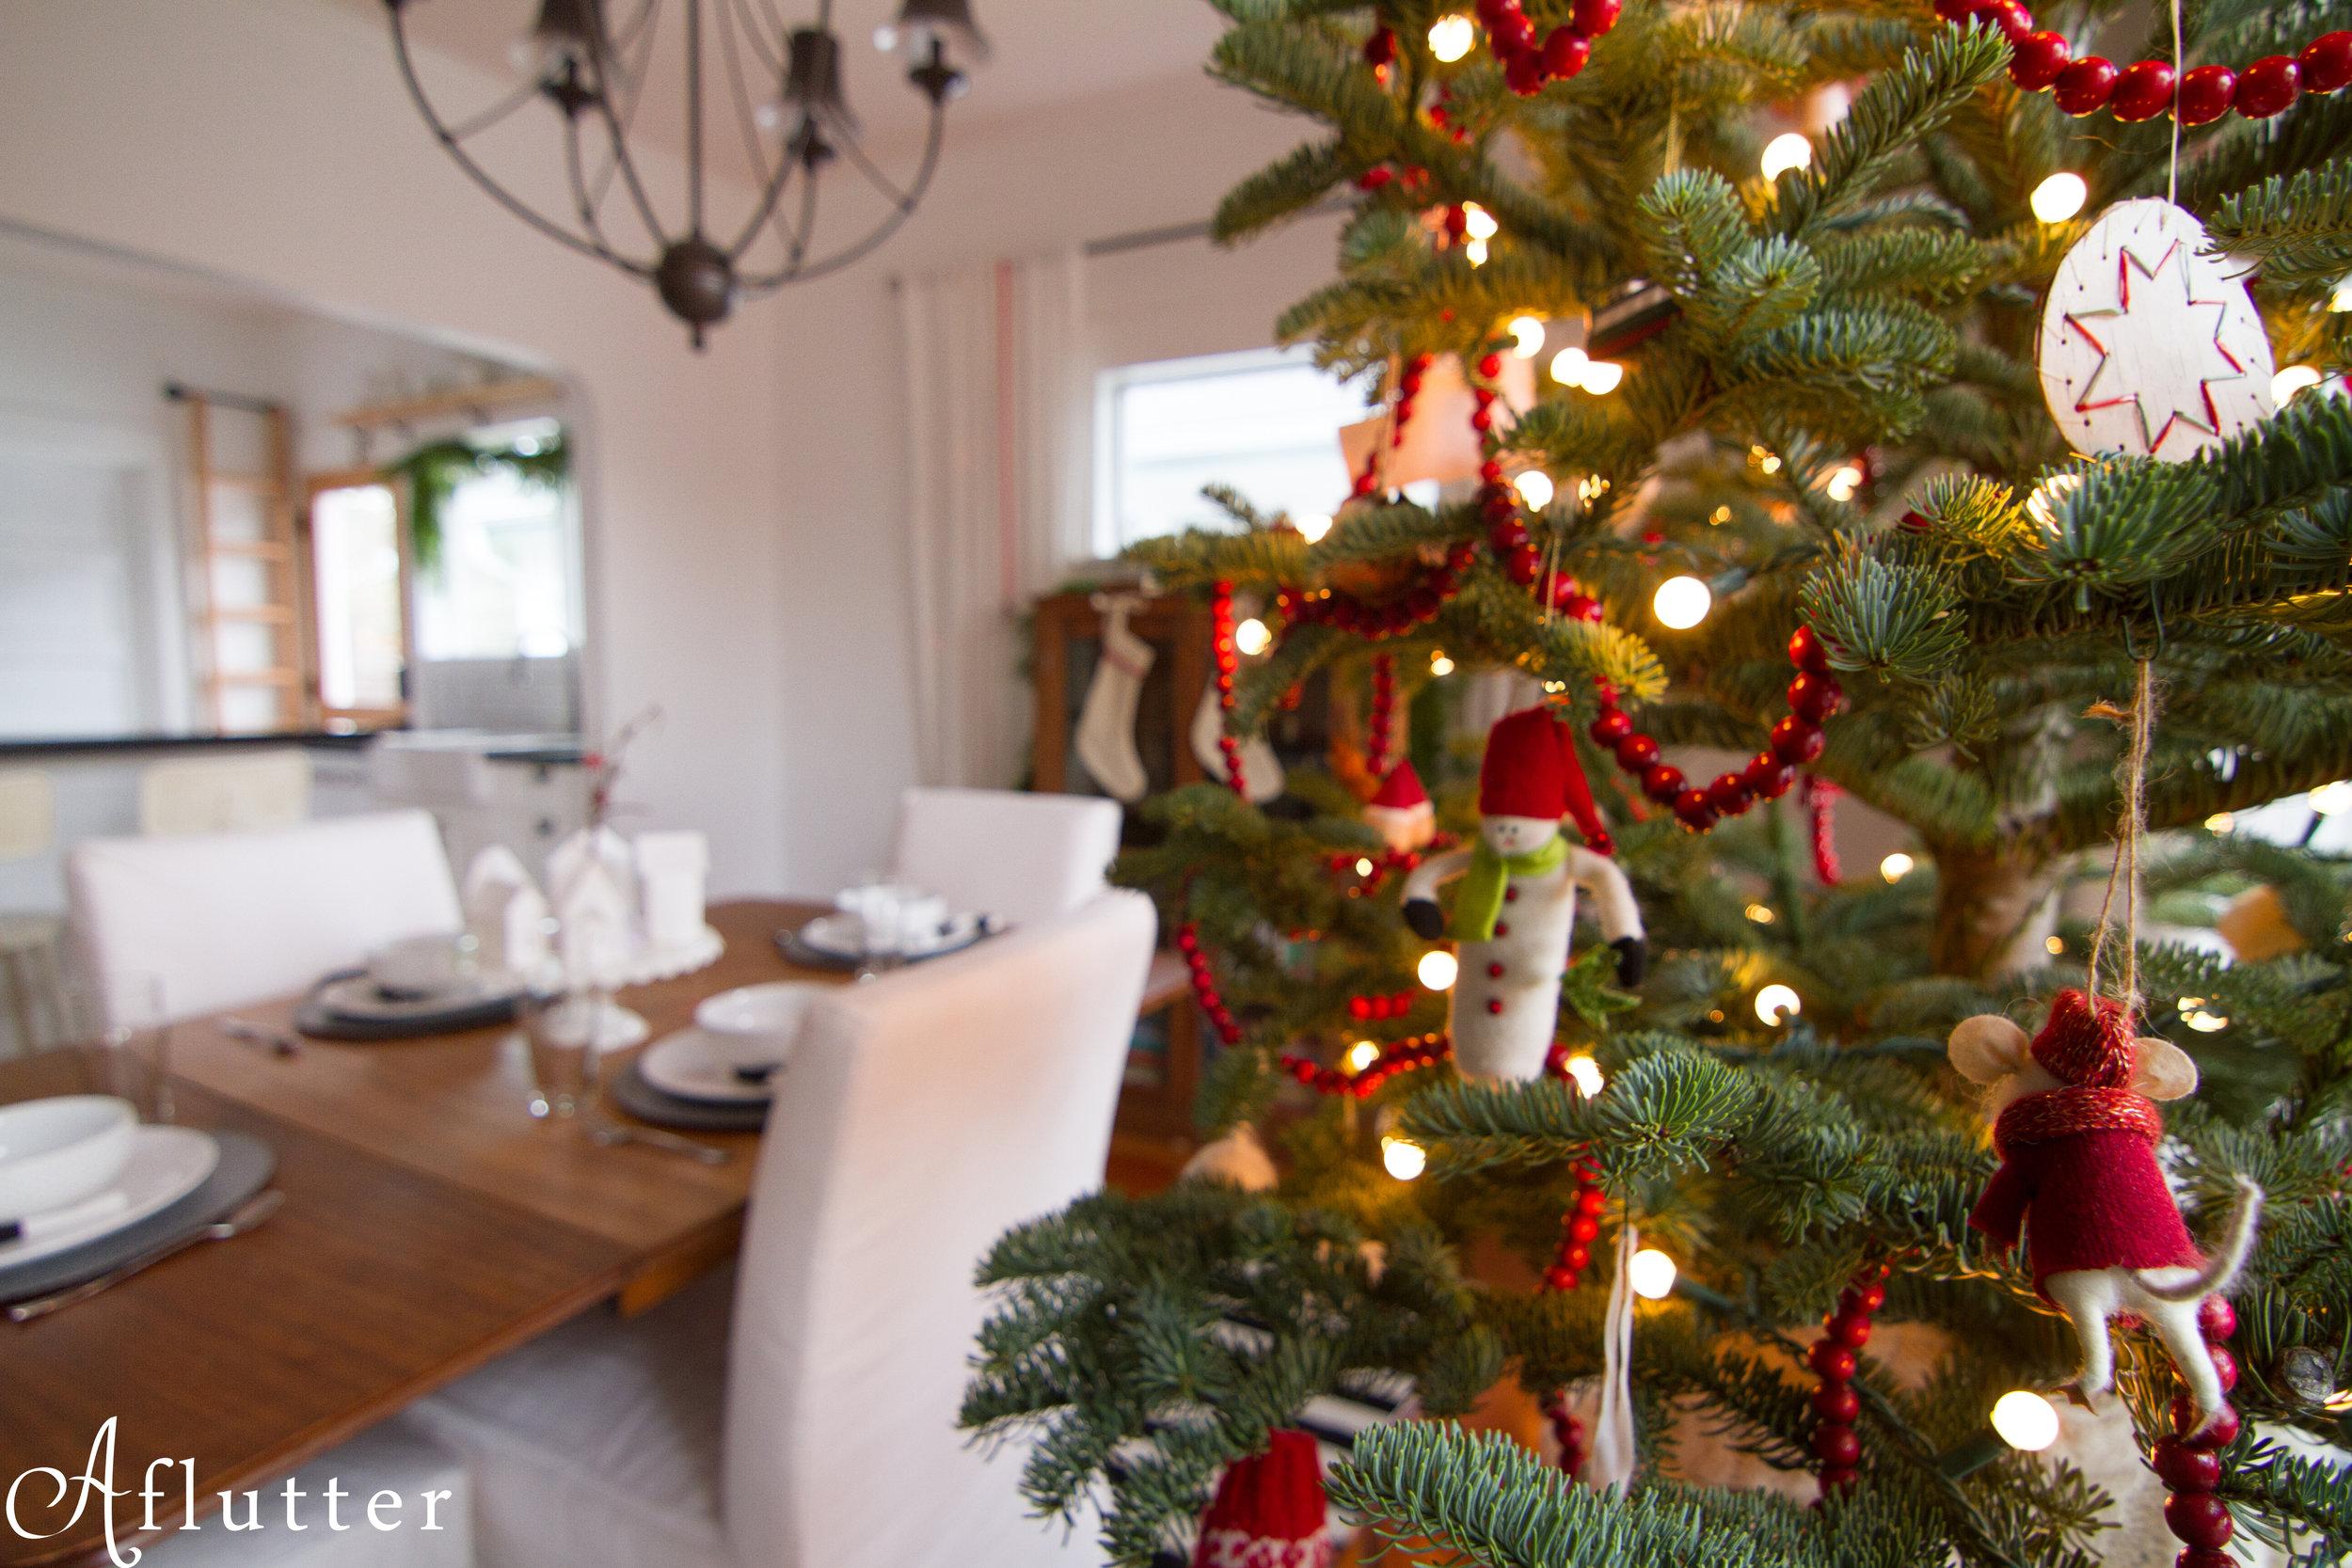 Christmas-Kitchen-Reveal-1-of-20.jpg